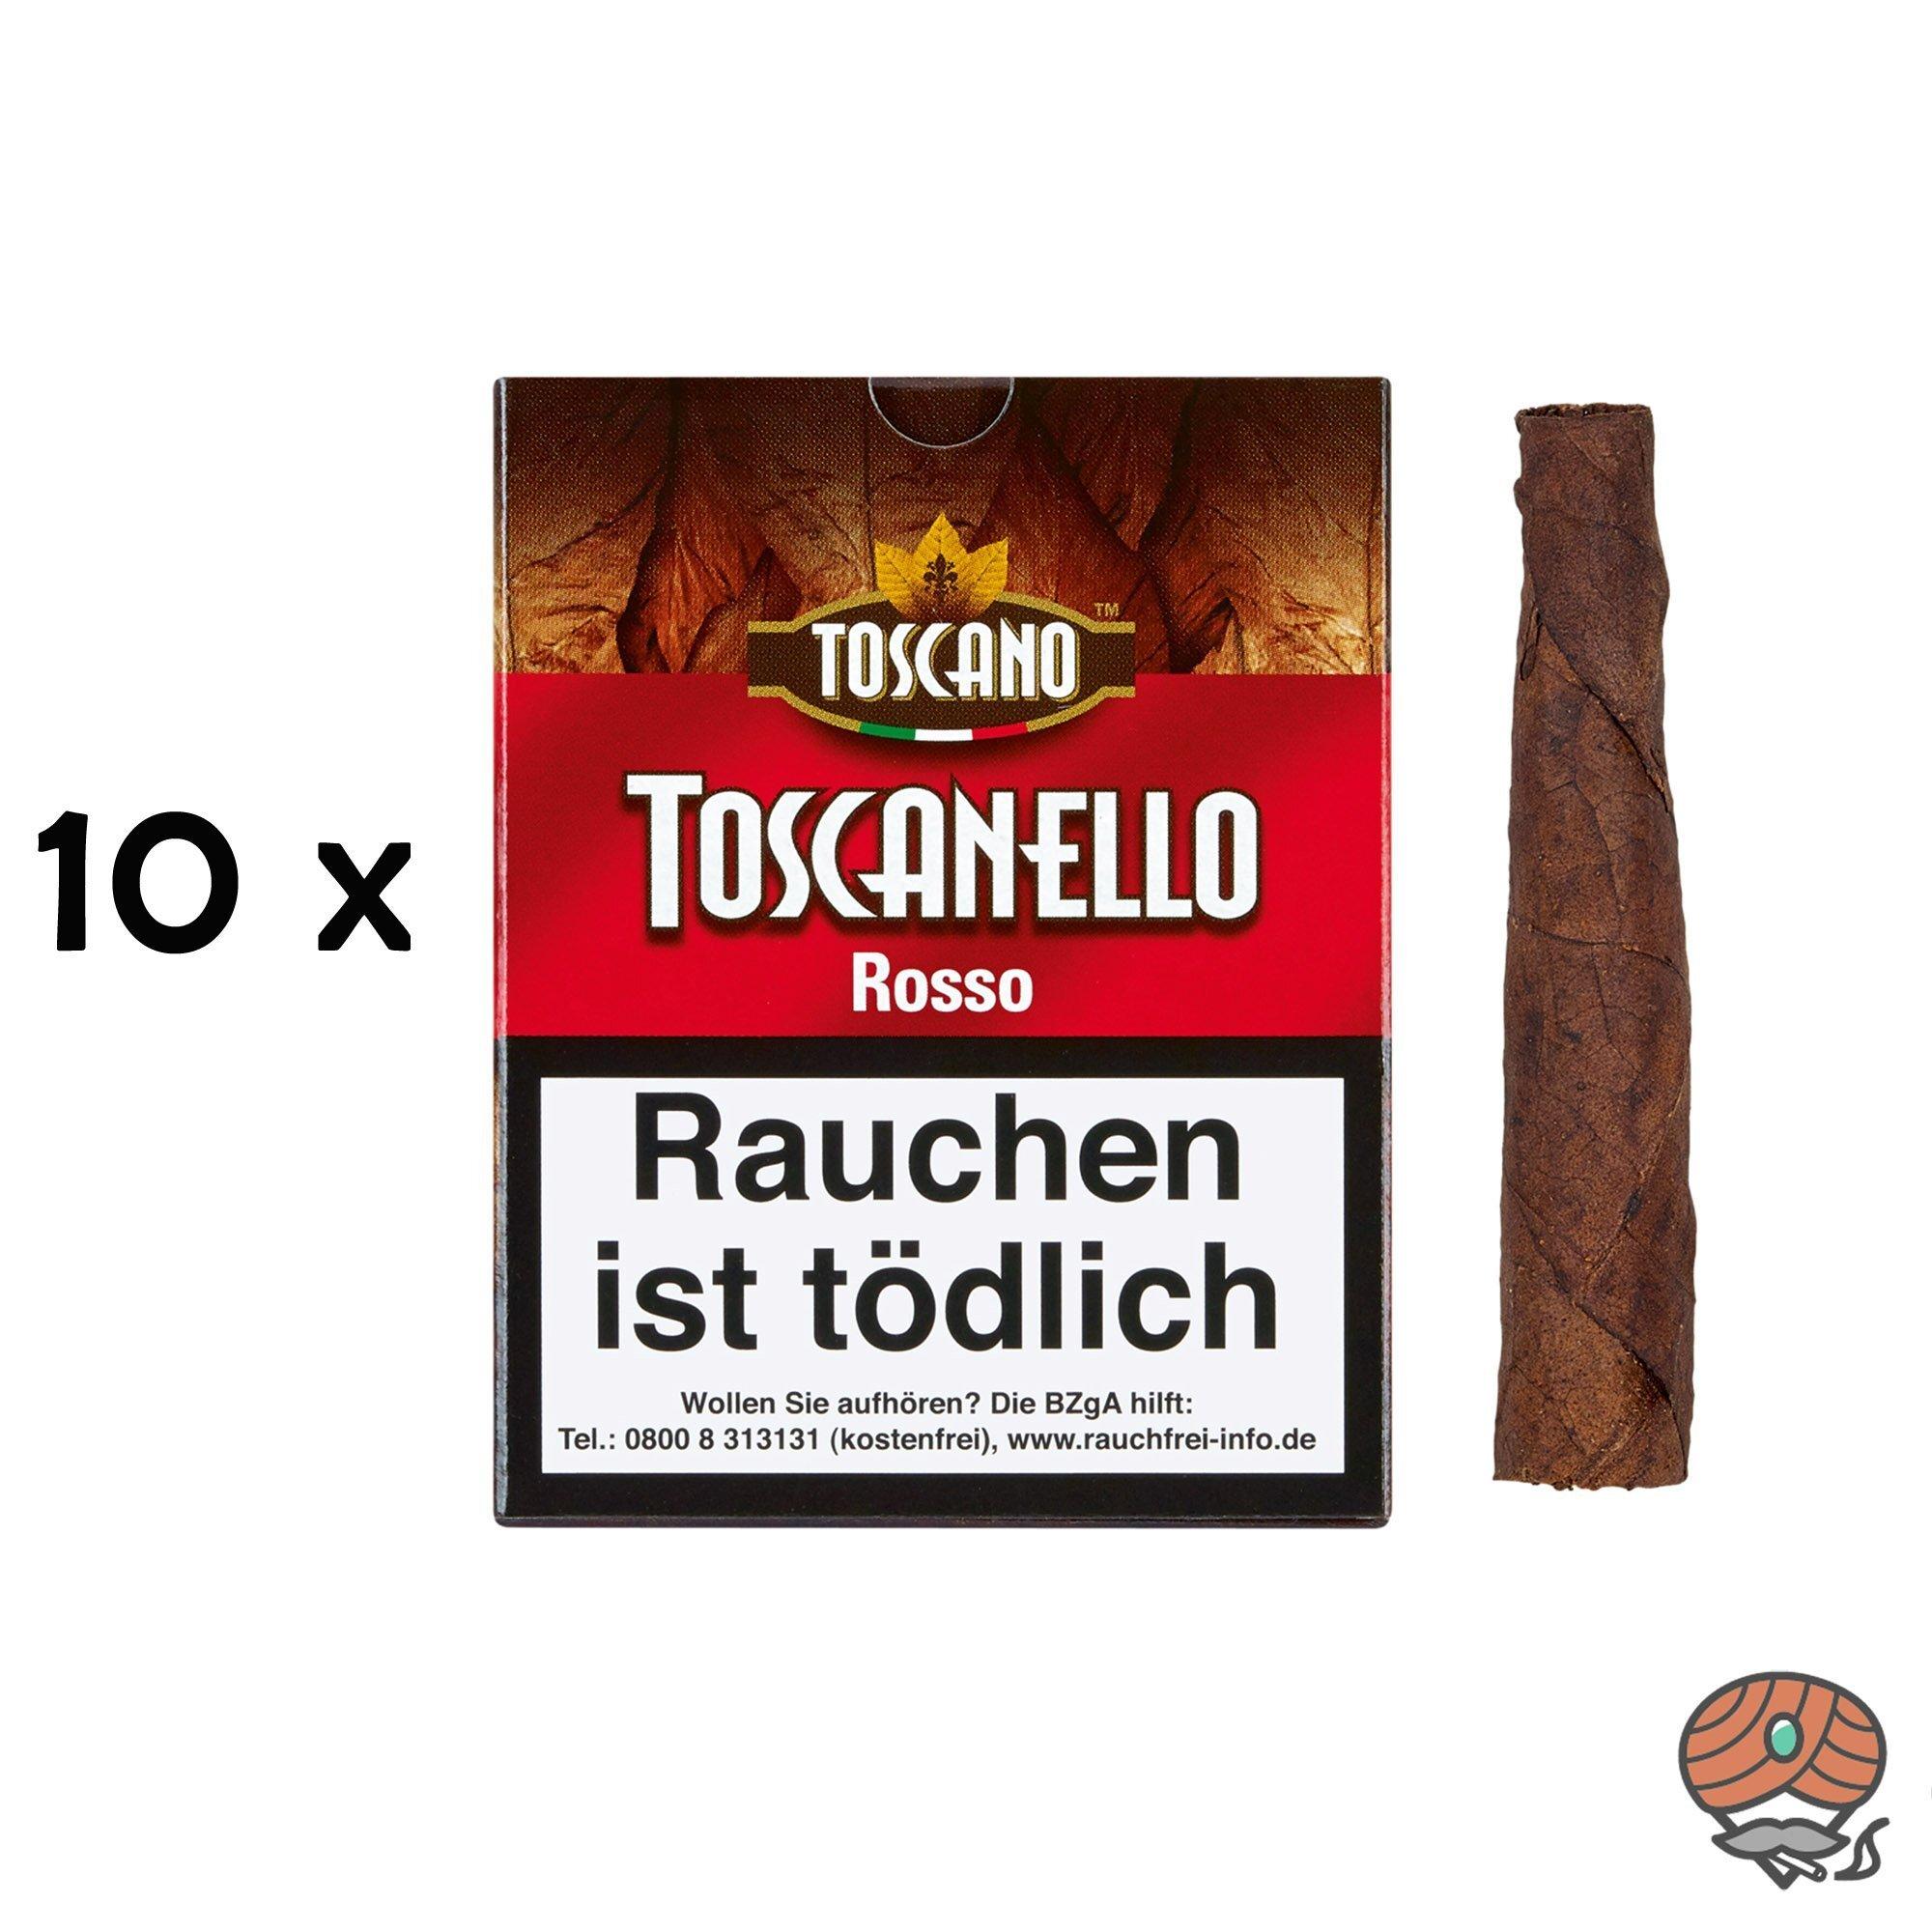 10 x Toscanello Rosso Zigarren (Kaffee)